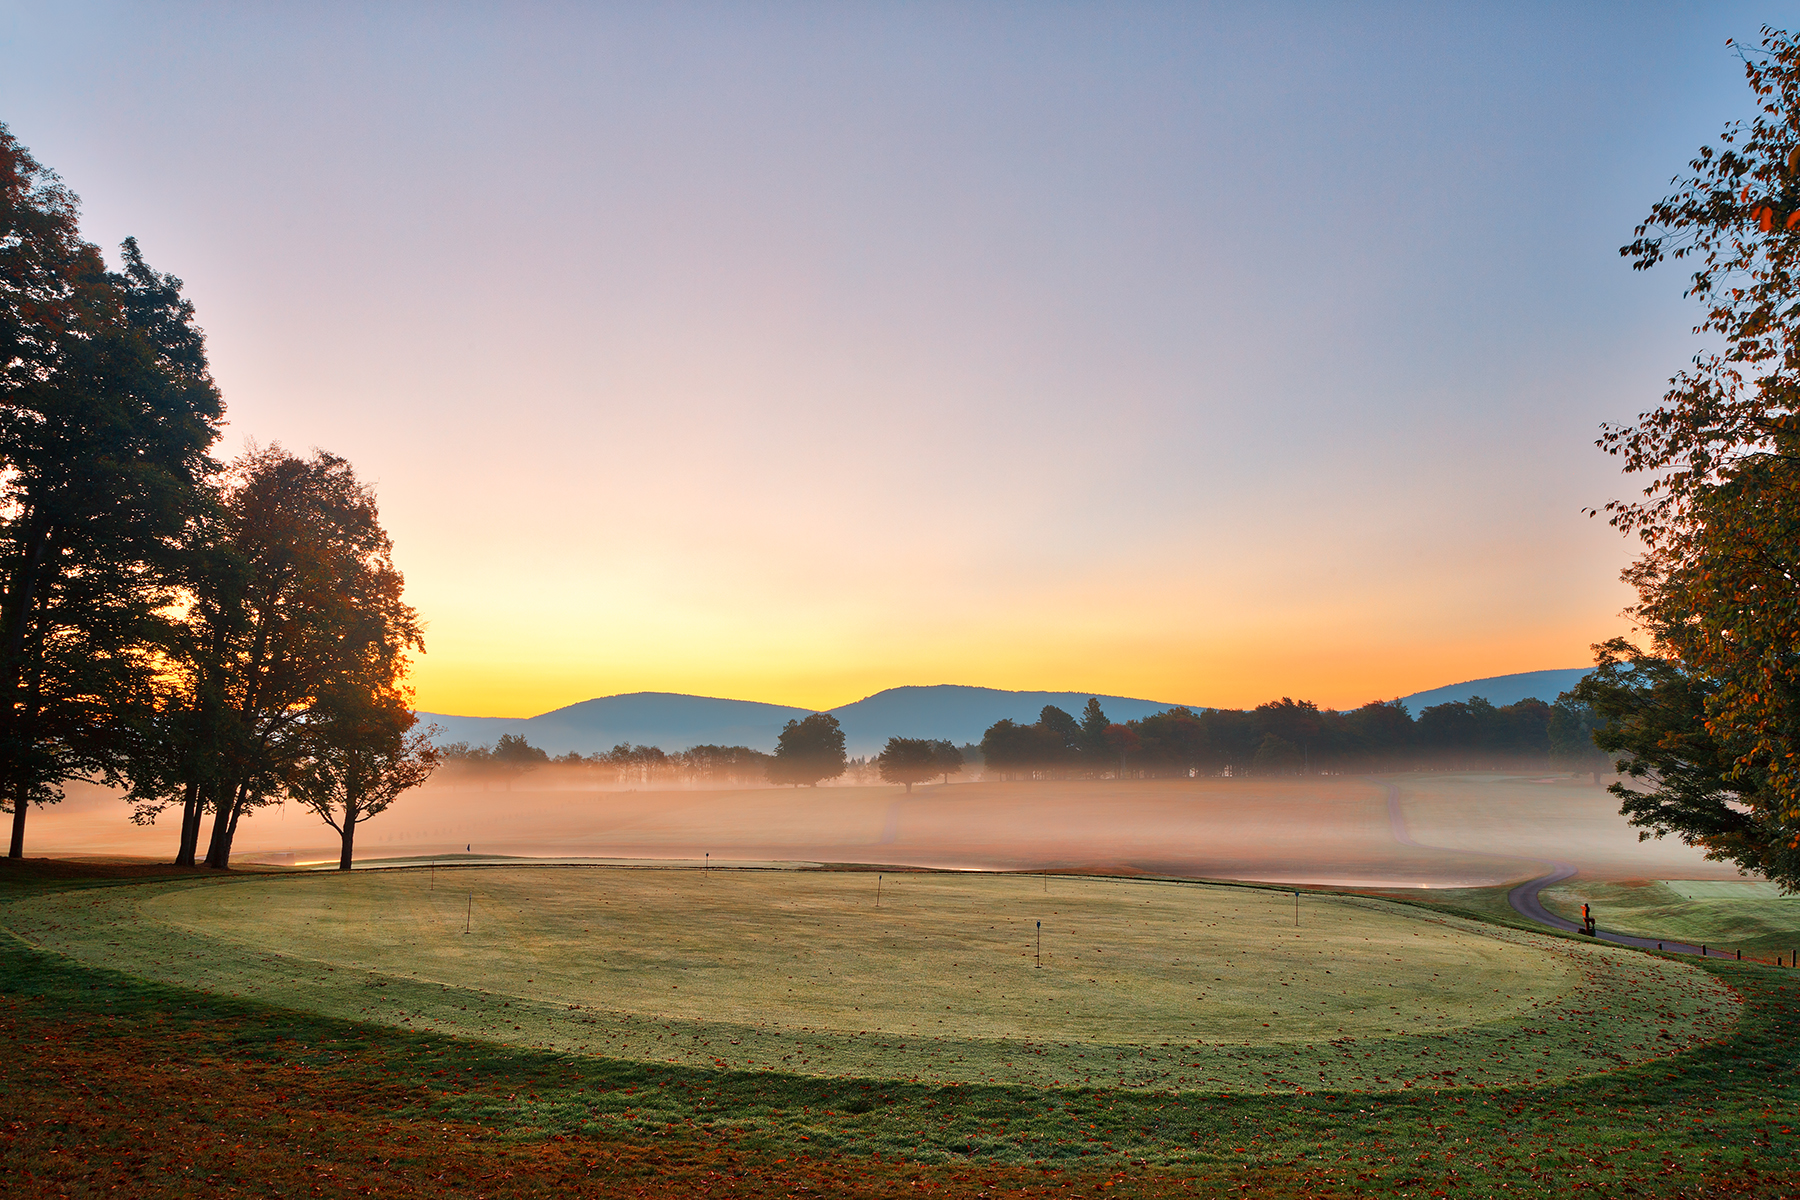 Misty Dawn Golf Course - HDR, America, Peaceful, Serene, Scenic, HQ Photo